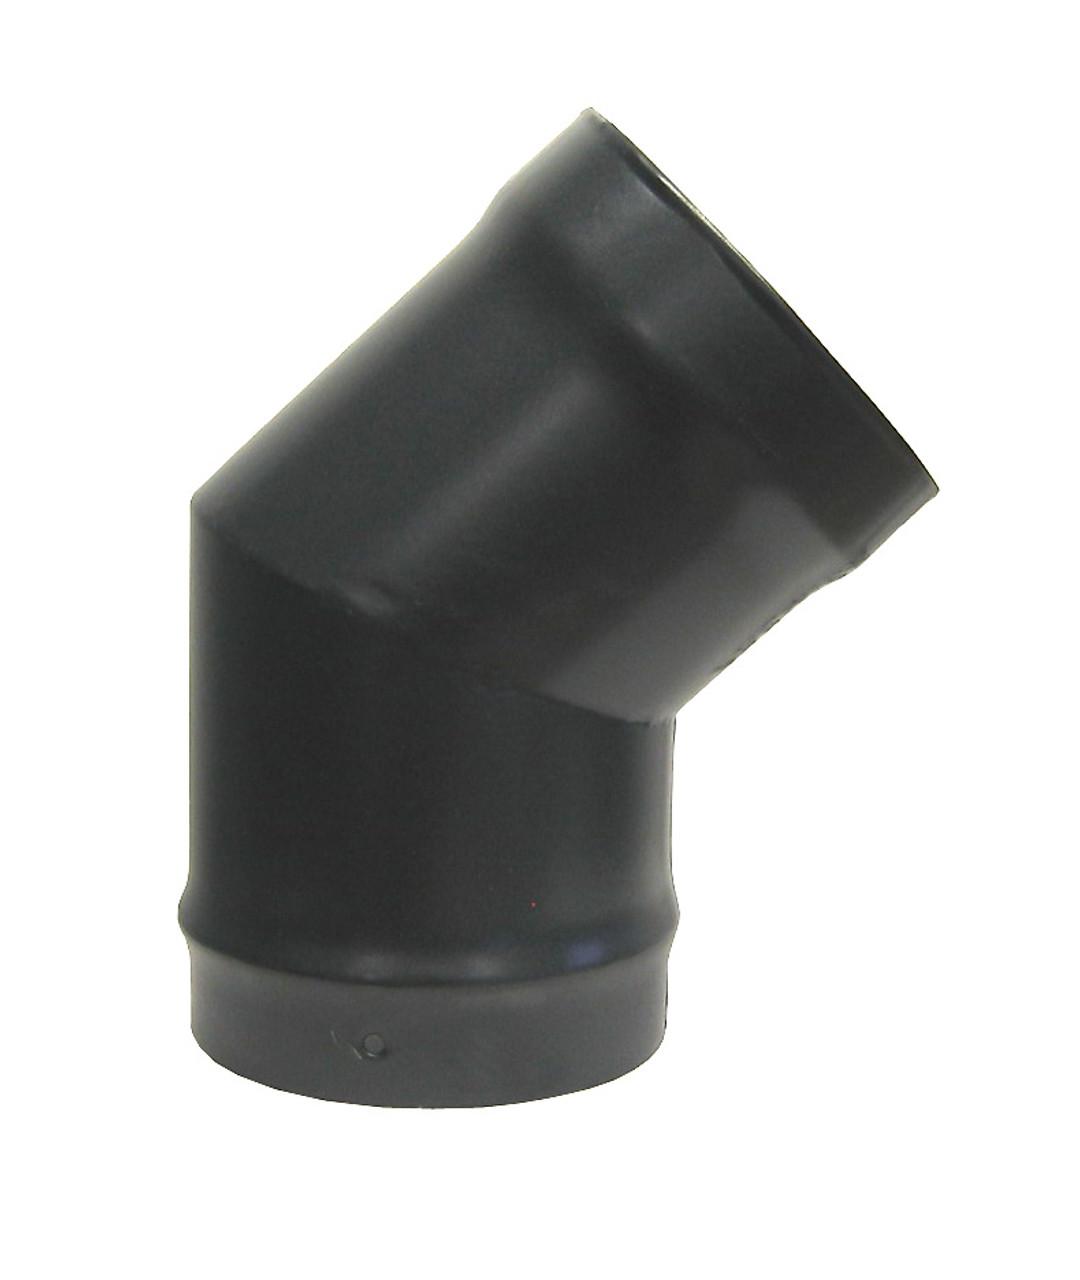 Pennine 4 90 Degree Elbow Vitreous Enamelled Multifuel Stove Flue Pipe